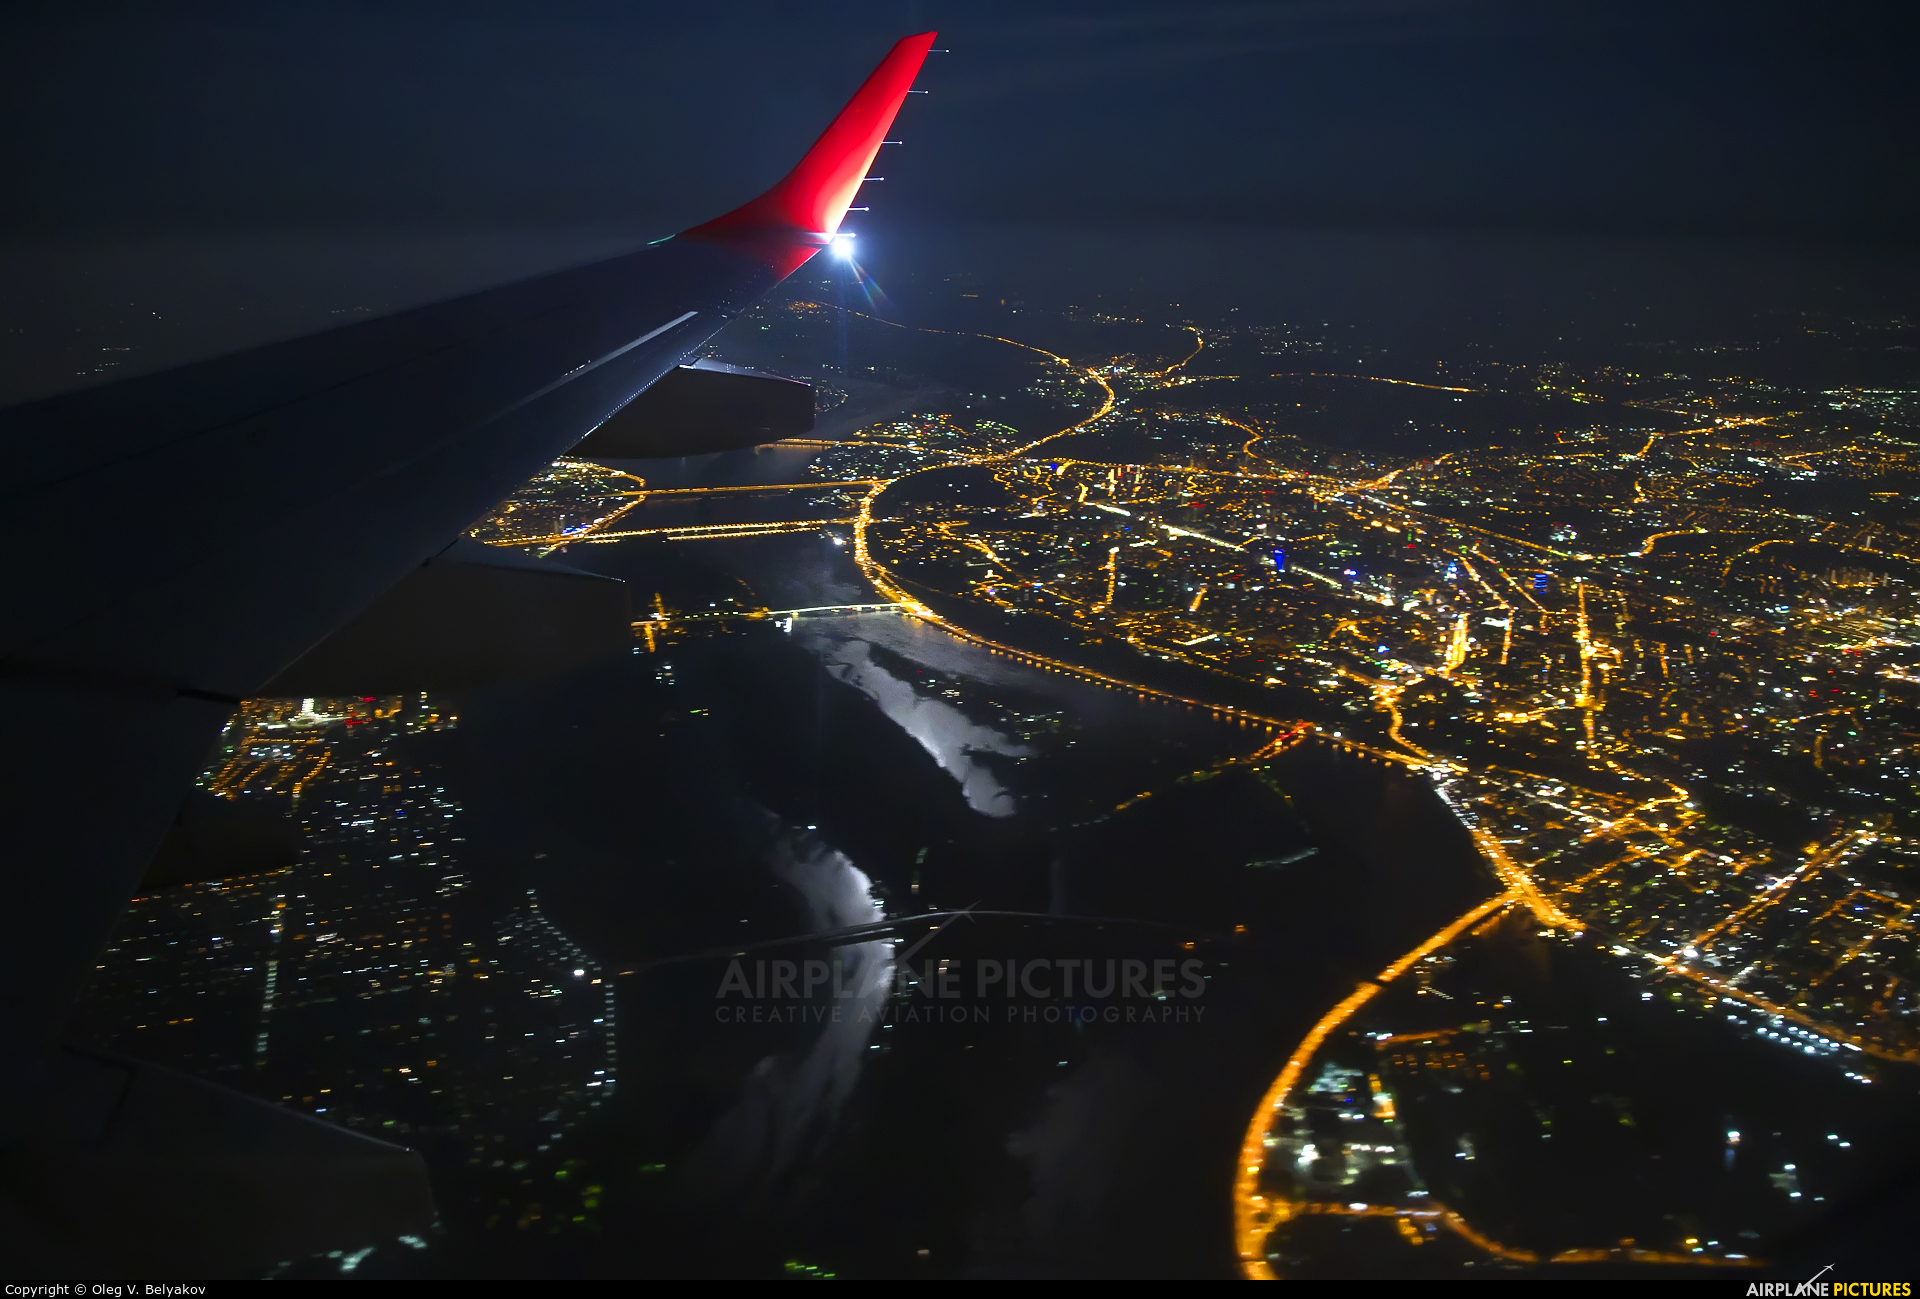 Austrian Airlines/Arrows/Tyrolean OE-LWM aircraft at In Flight - Ukraine